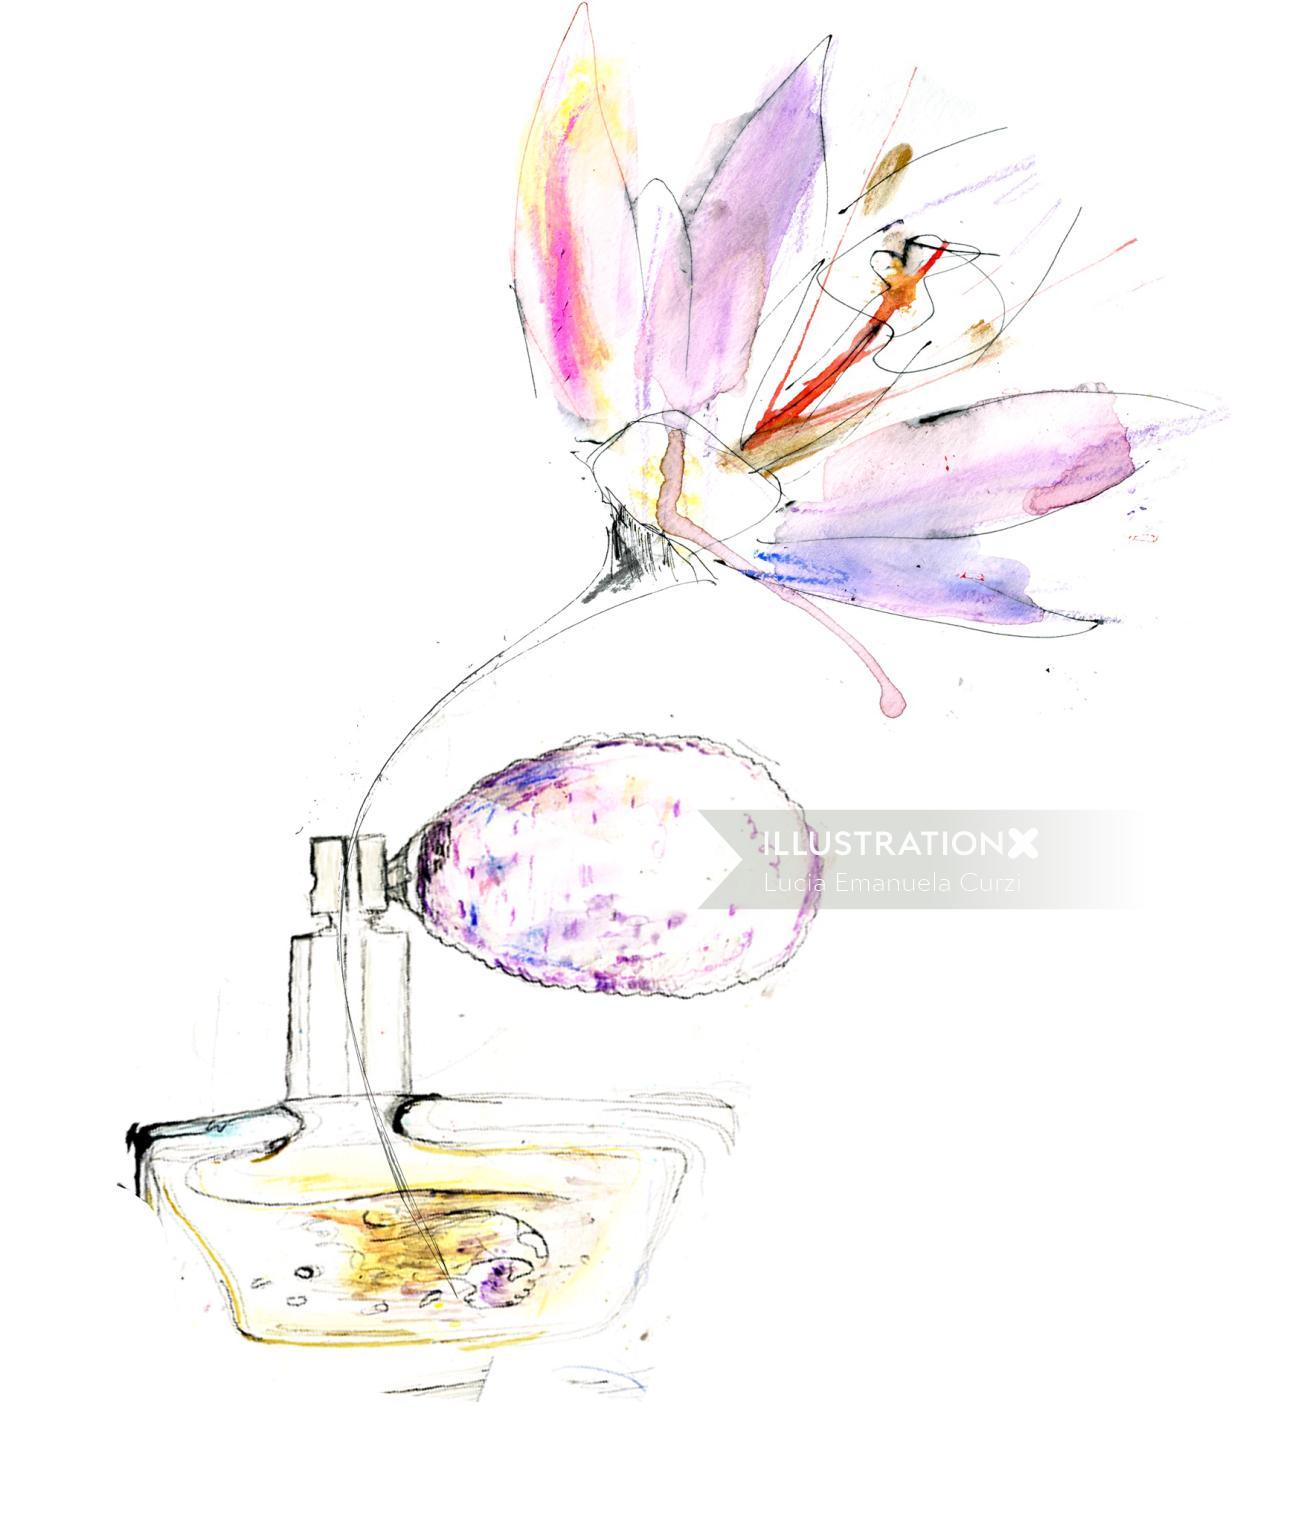 Flower illustration by Lucia Emanuela Curzi